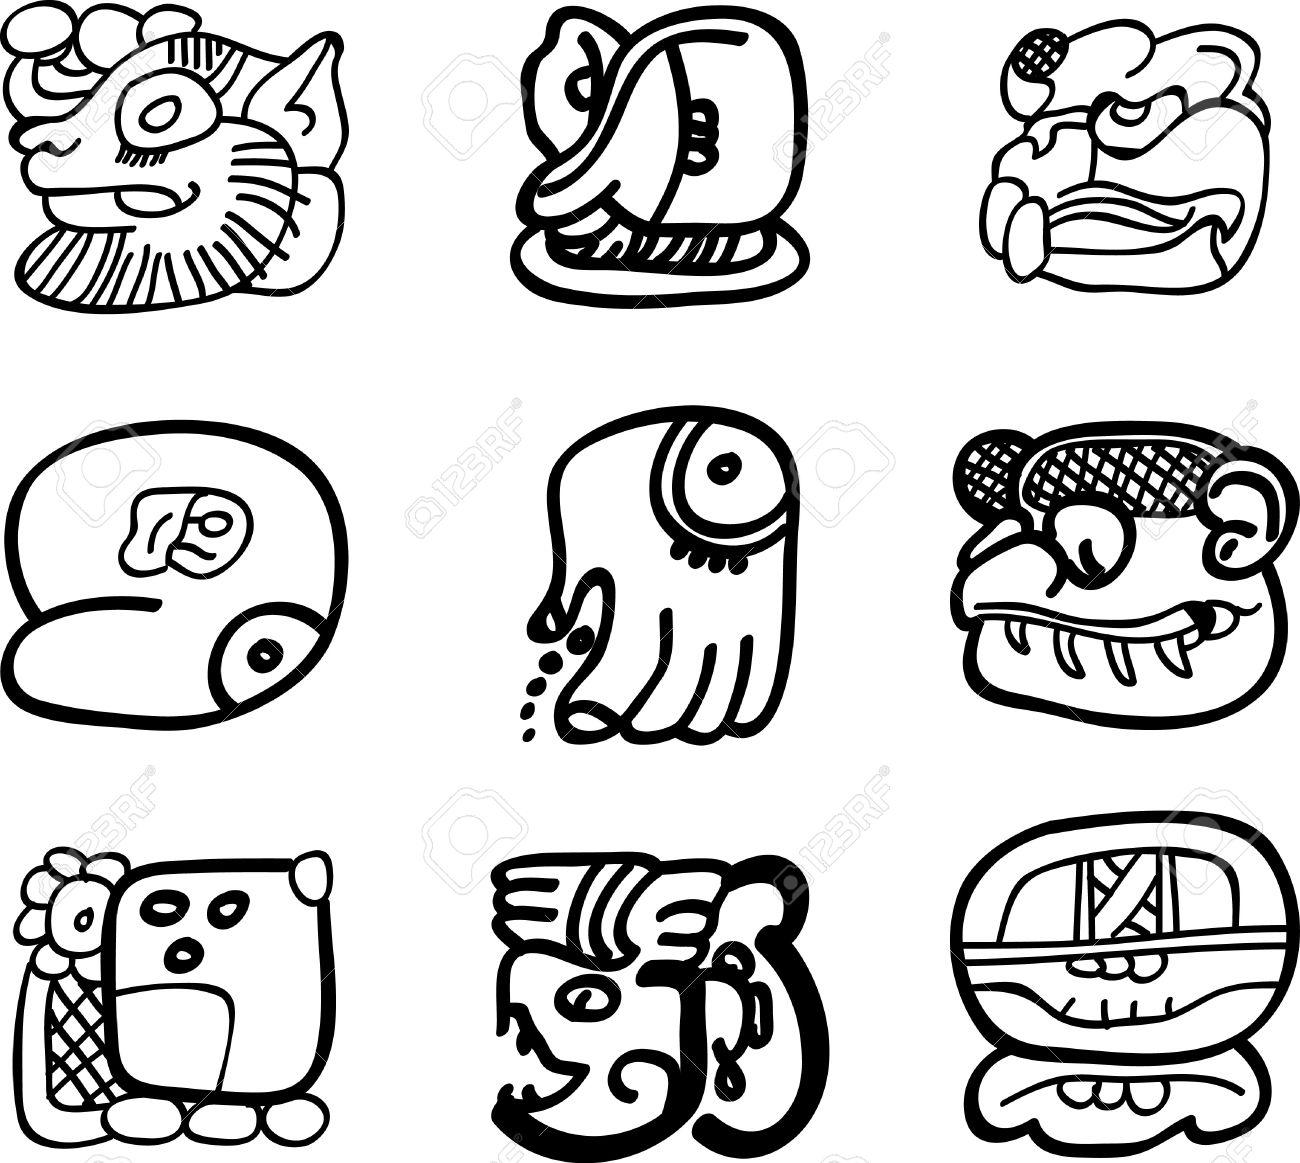 Mexican, aztec or maya motifs, glyphs Stock Vector - 9873640